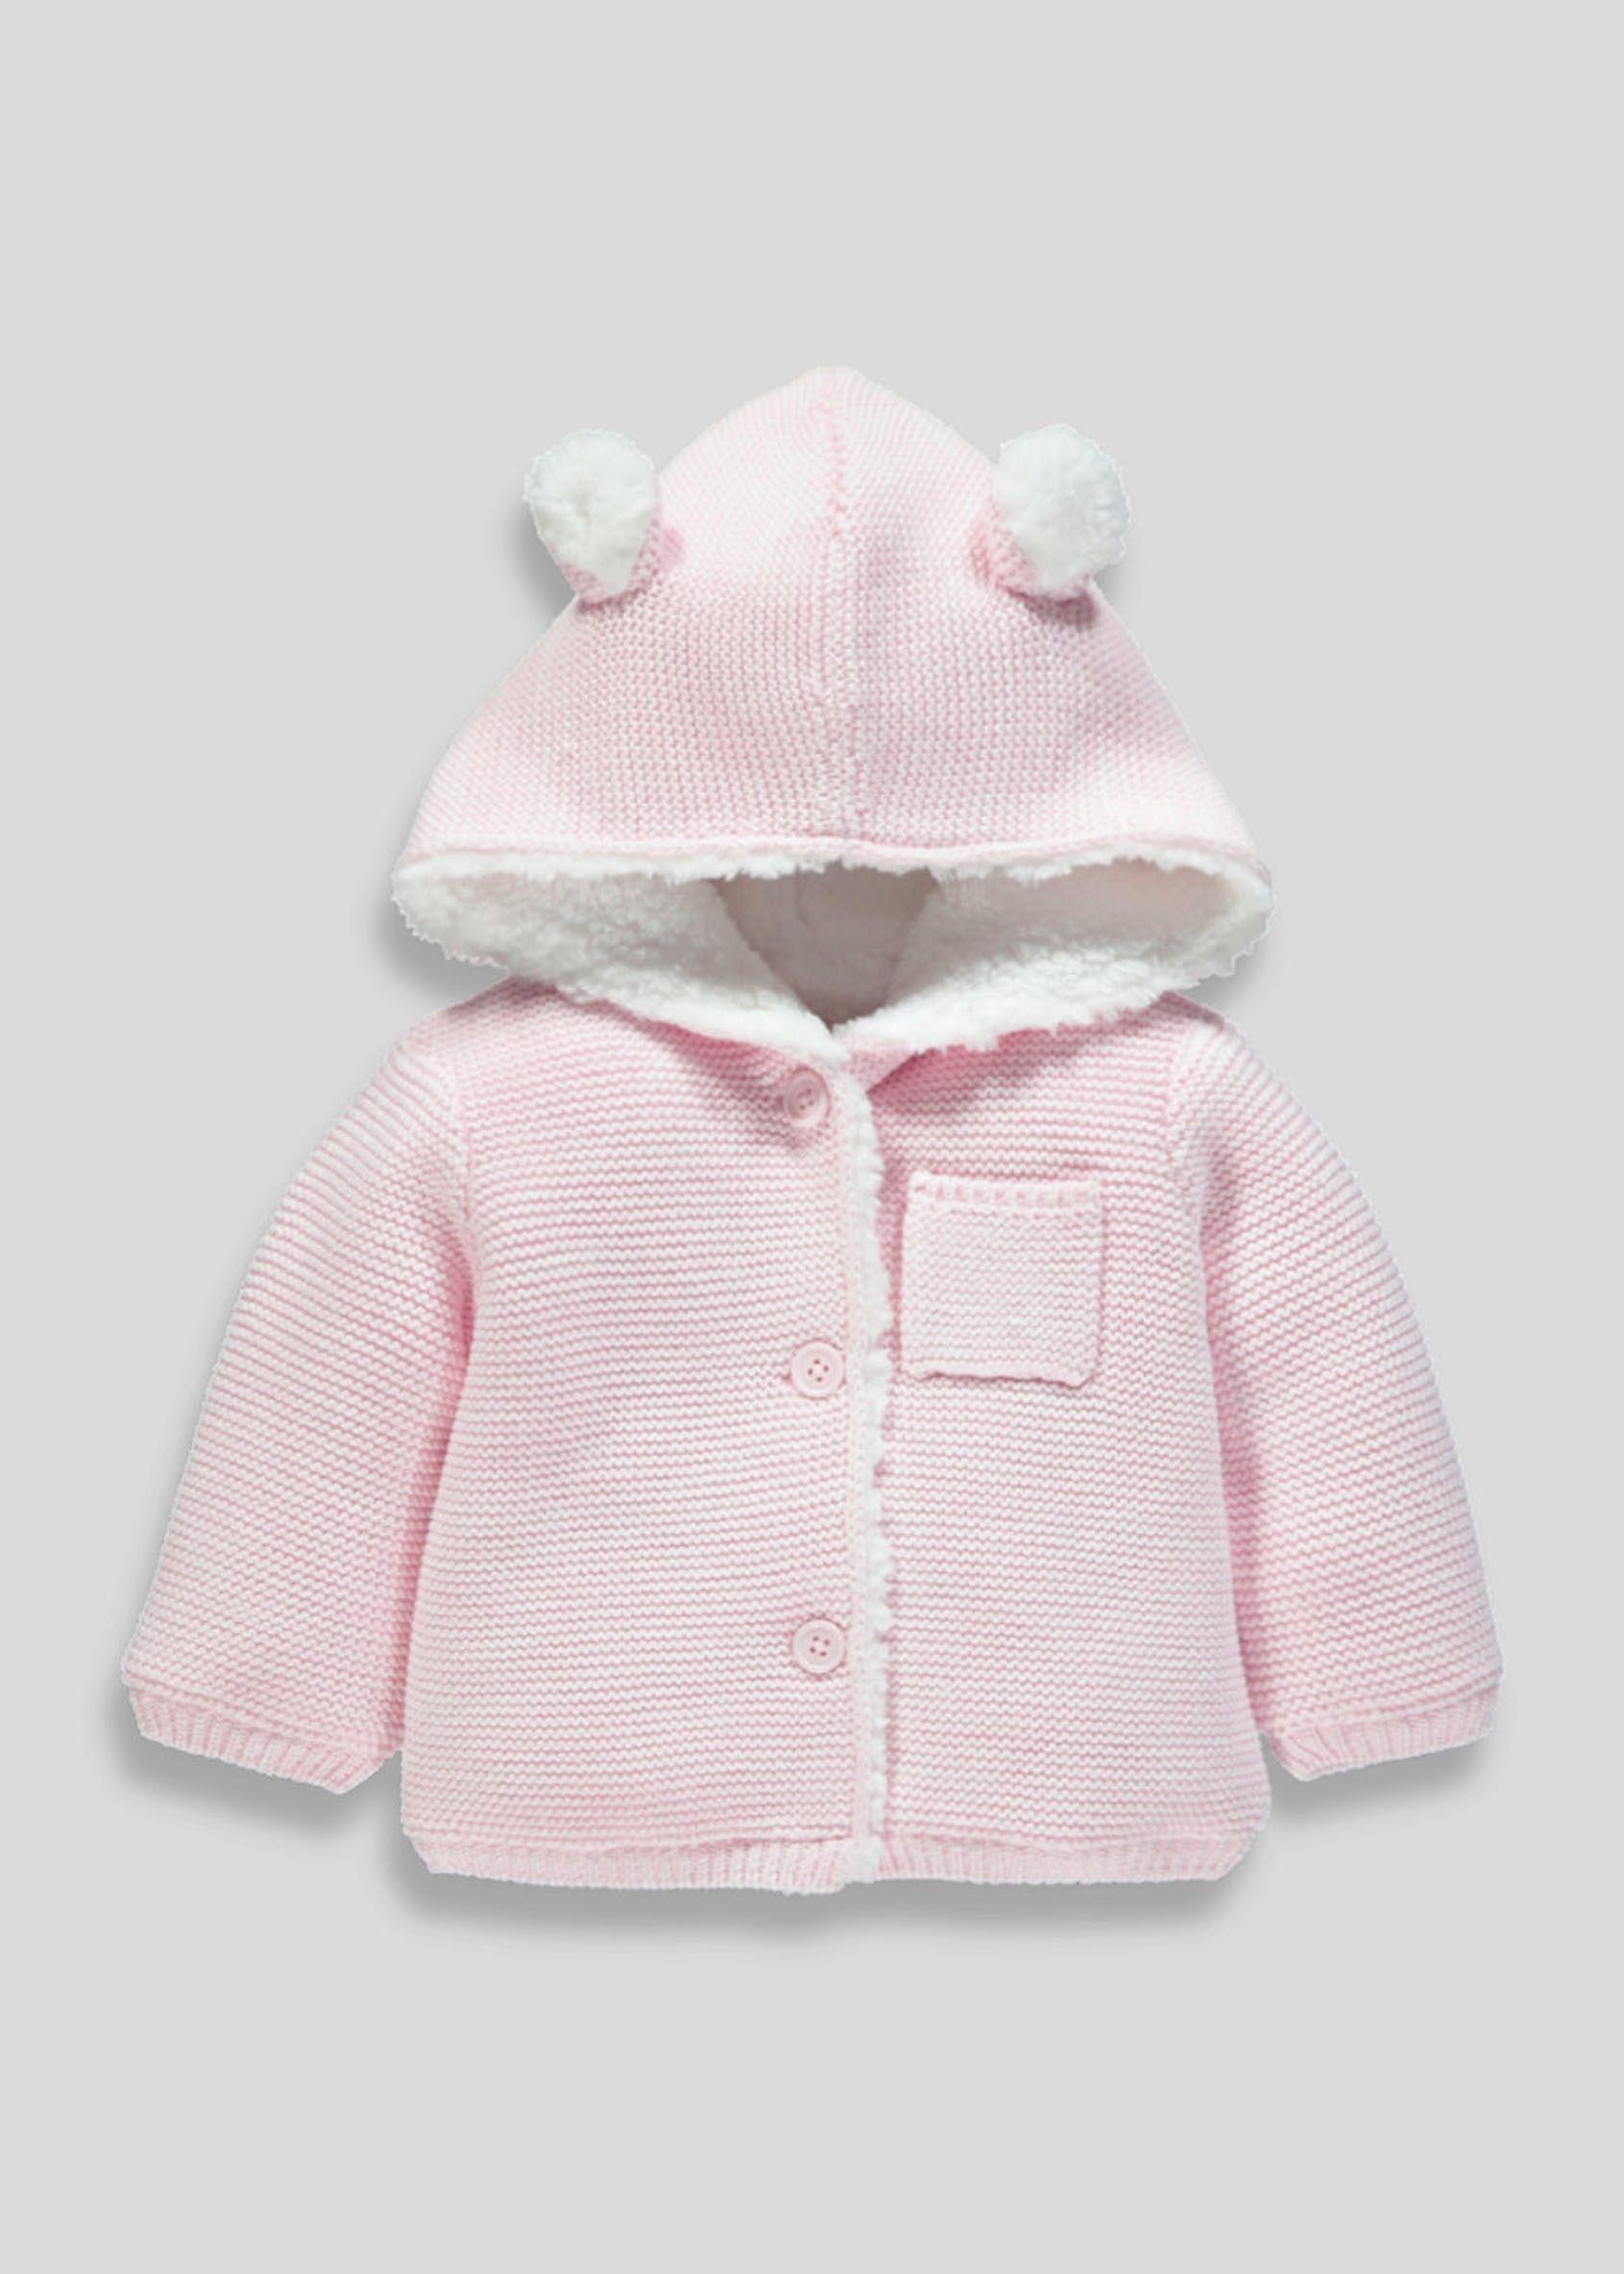 895749576 Unisex Bunny Hooded Cardigan (Tiny Baby-18mths)